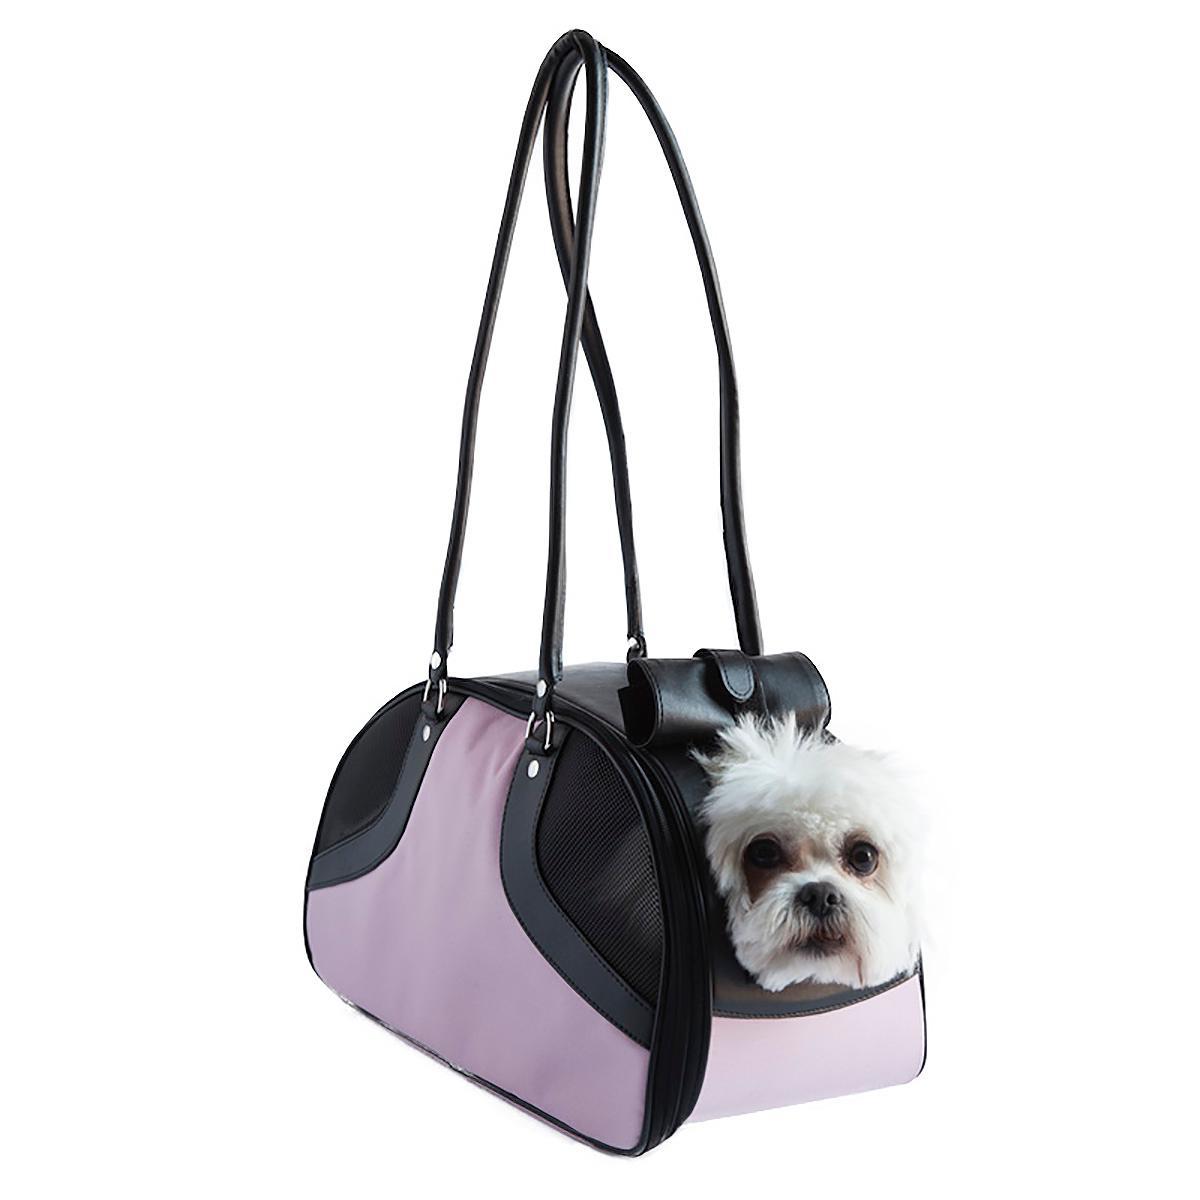 Petote Roxy Dog Carrier Handbag - Pink & Black